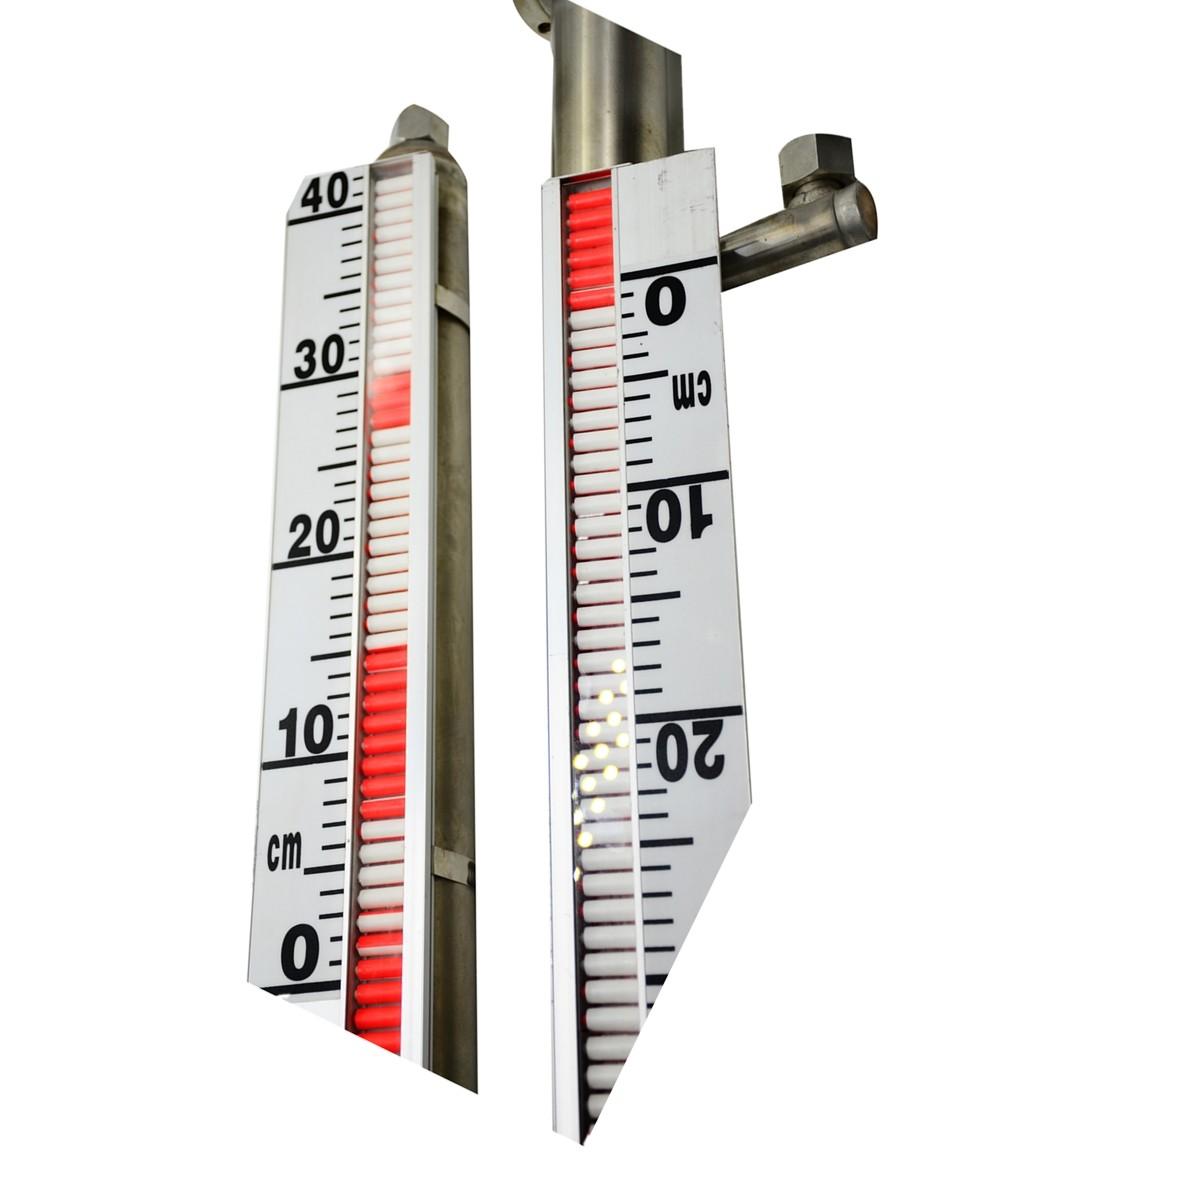 20cm Magnetic Flap Level Gauge for Cold Room Manufacturers, 20cm Magnetic Flap Level Gauge for Cold Room Factory, Supply 20cm Magnetic Flap Level Gauge for Cold Room